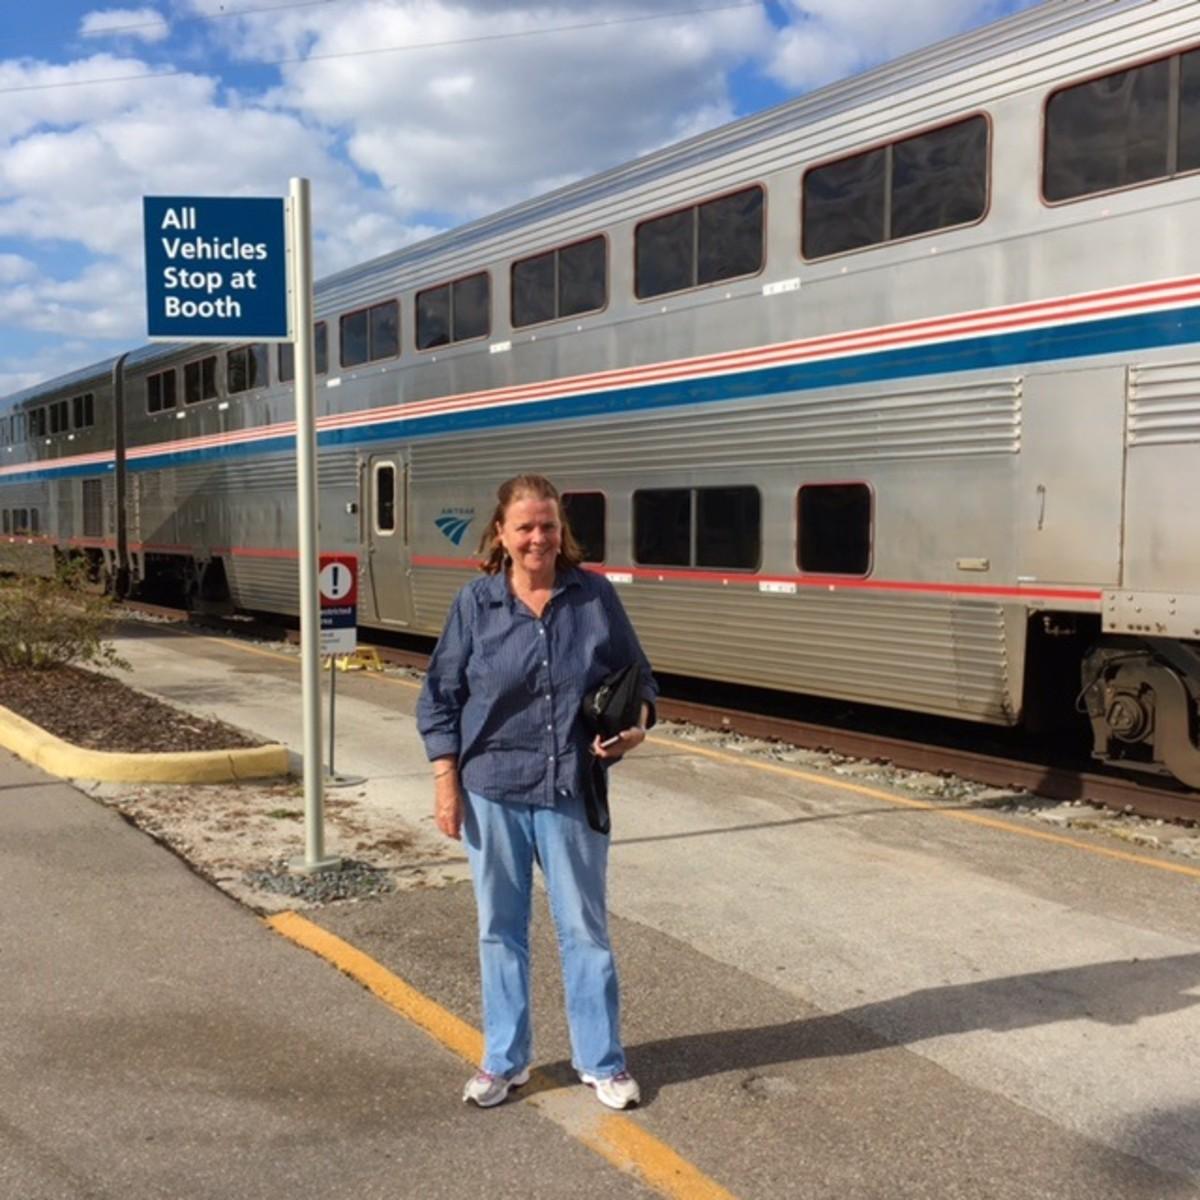 Auto Train from Sanford, FL to Lorton, VA